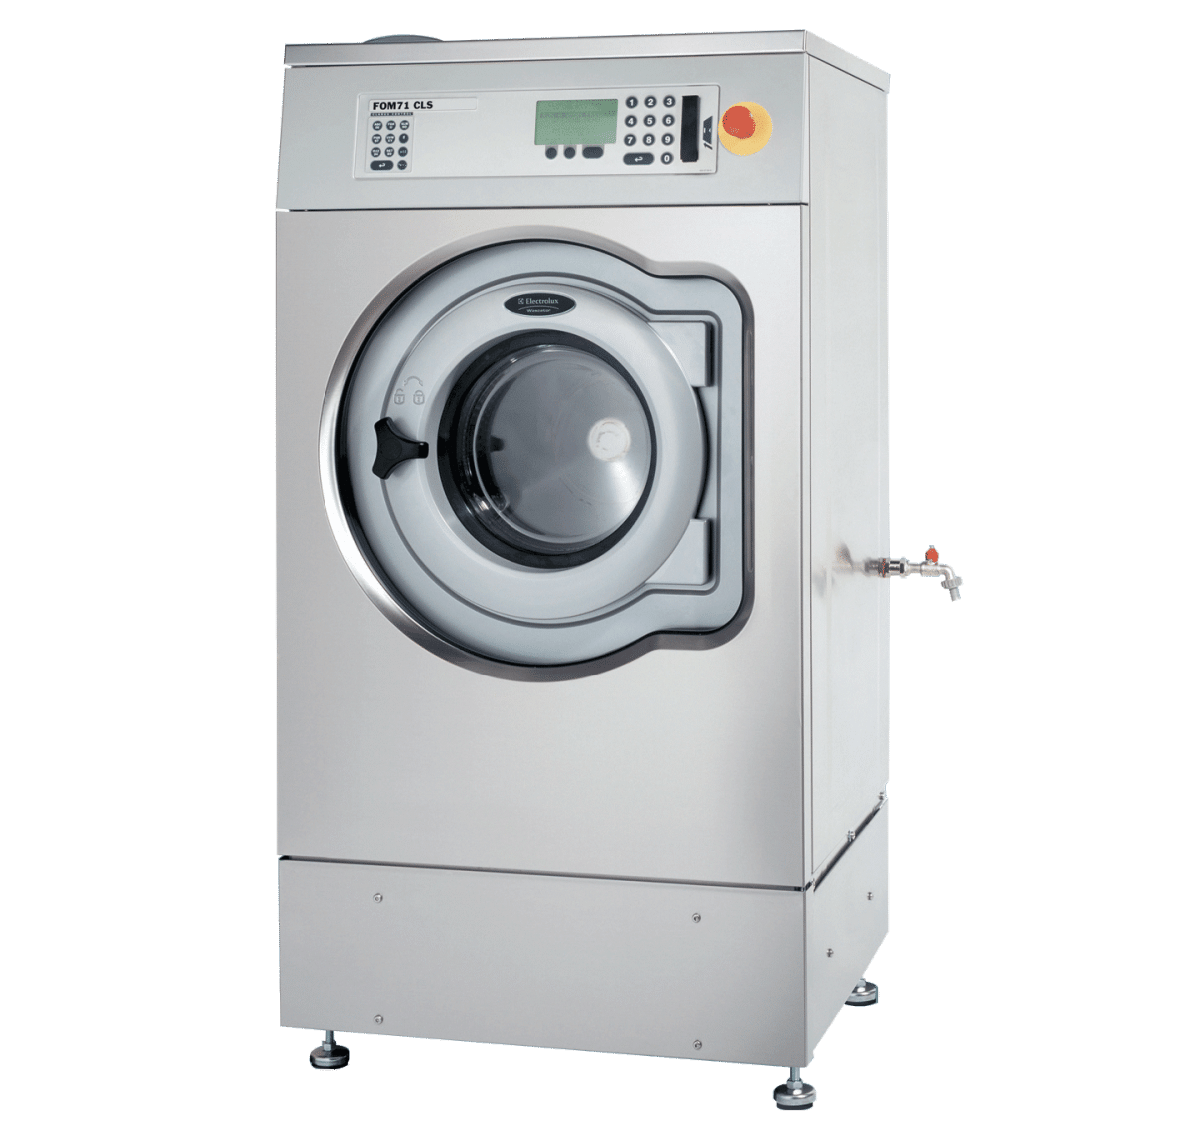 Wascator FOM 71 CLS - Waschtester - Waschmaschine